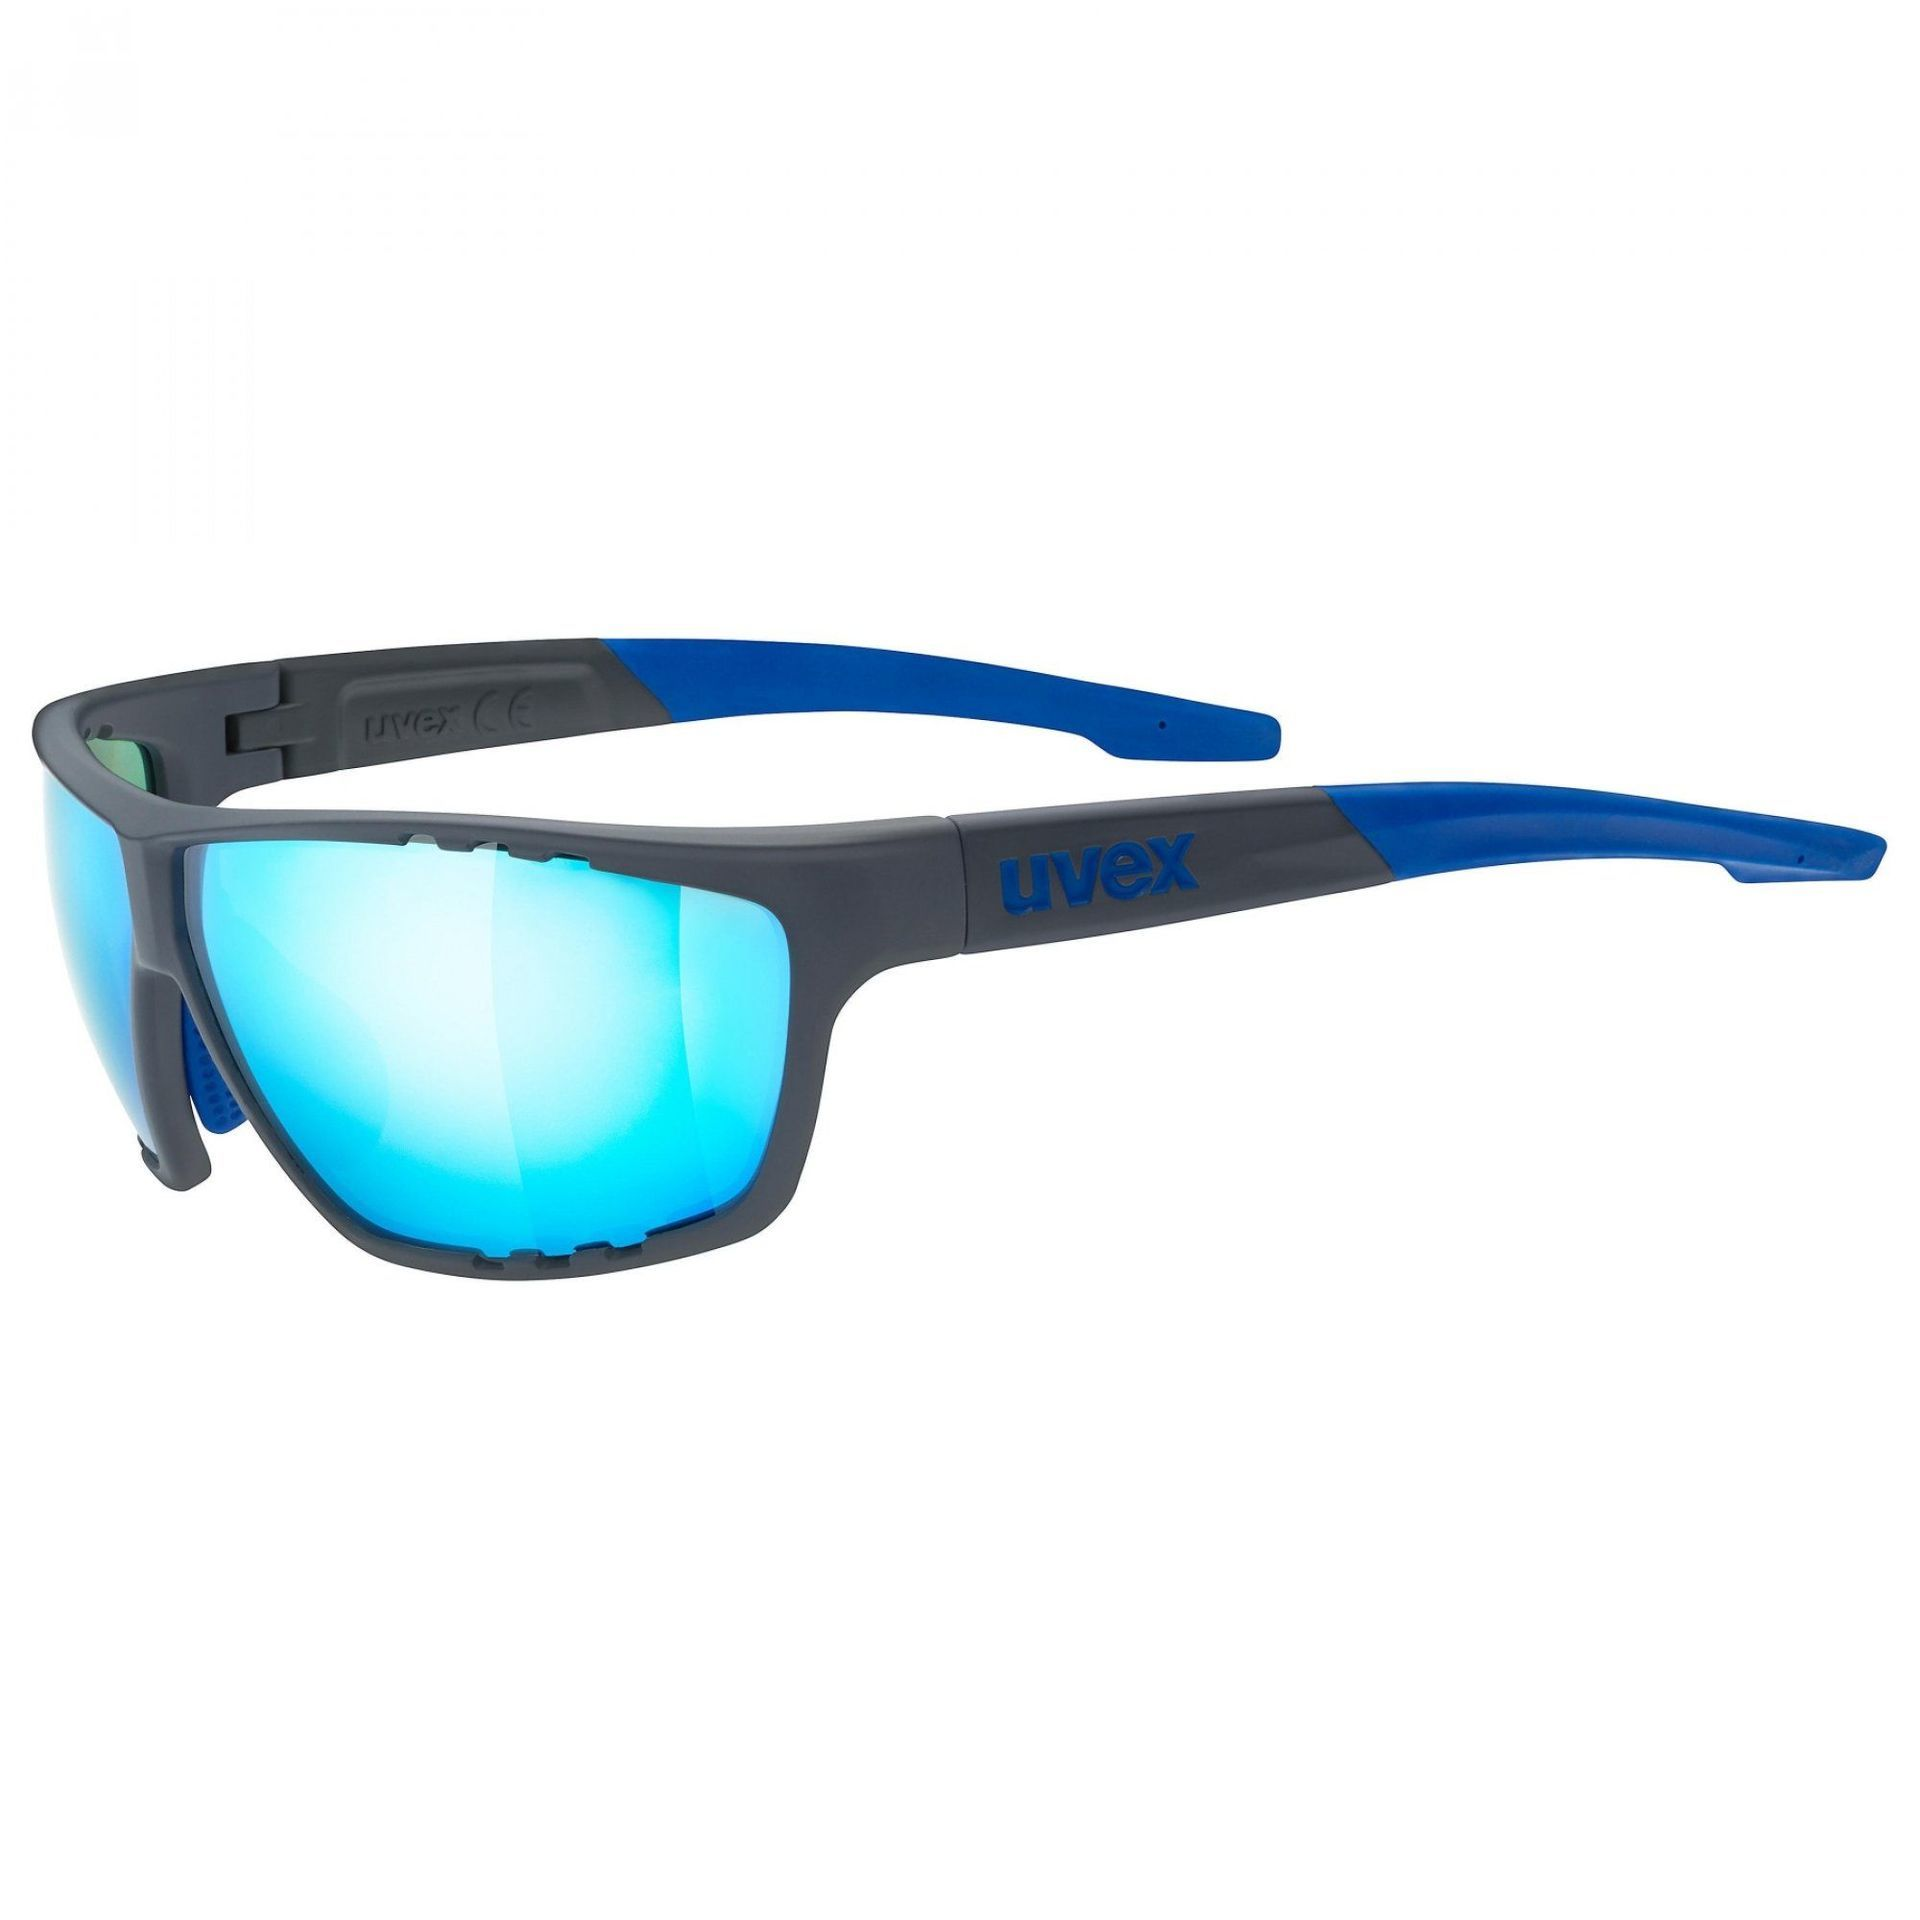 OKULARY UVEX  SPORTSTYLE 706 BLUE MAT